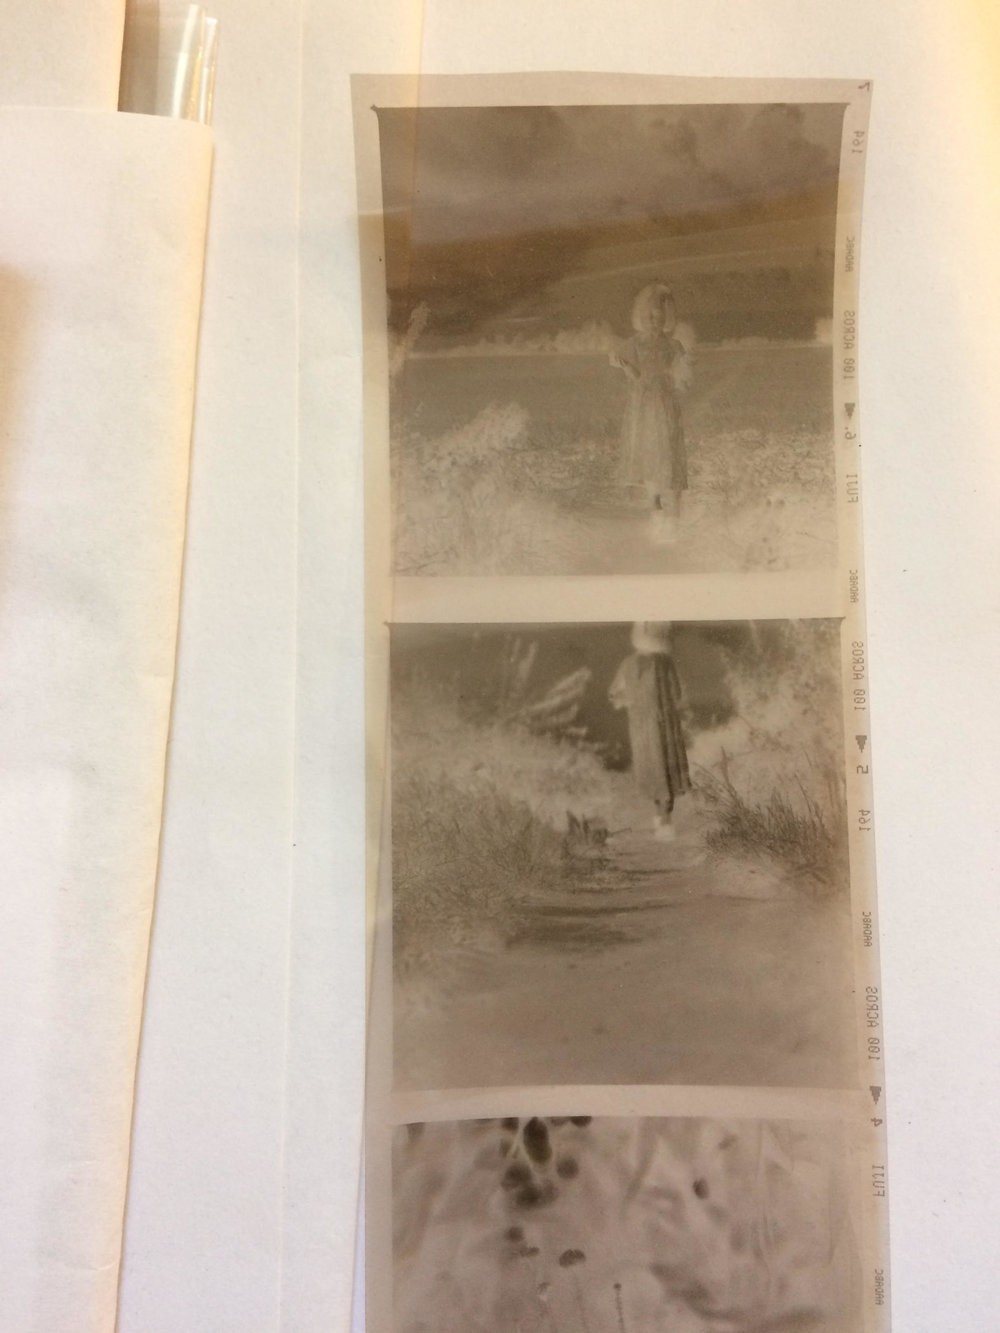 Cafenol negatives of Fordham pathways.  Gudrun Filipska - Carly Butler.